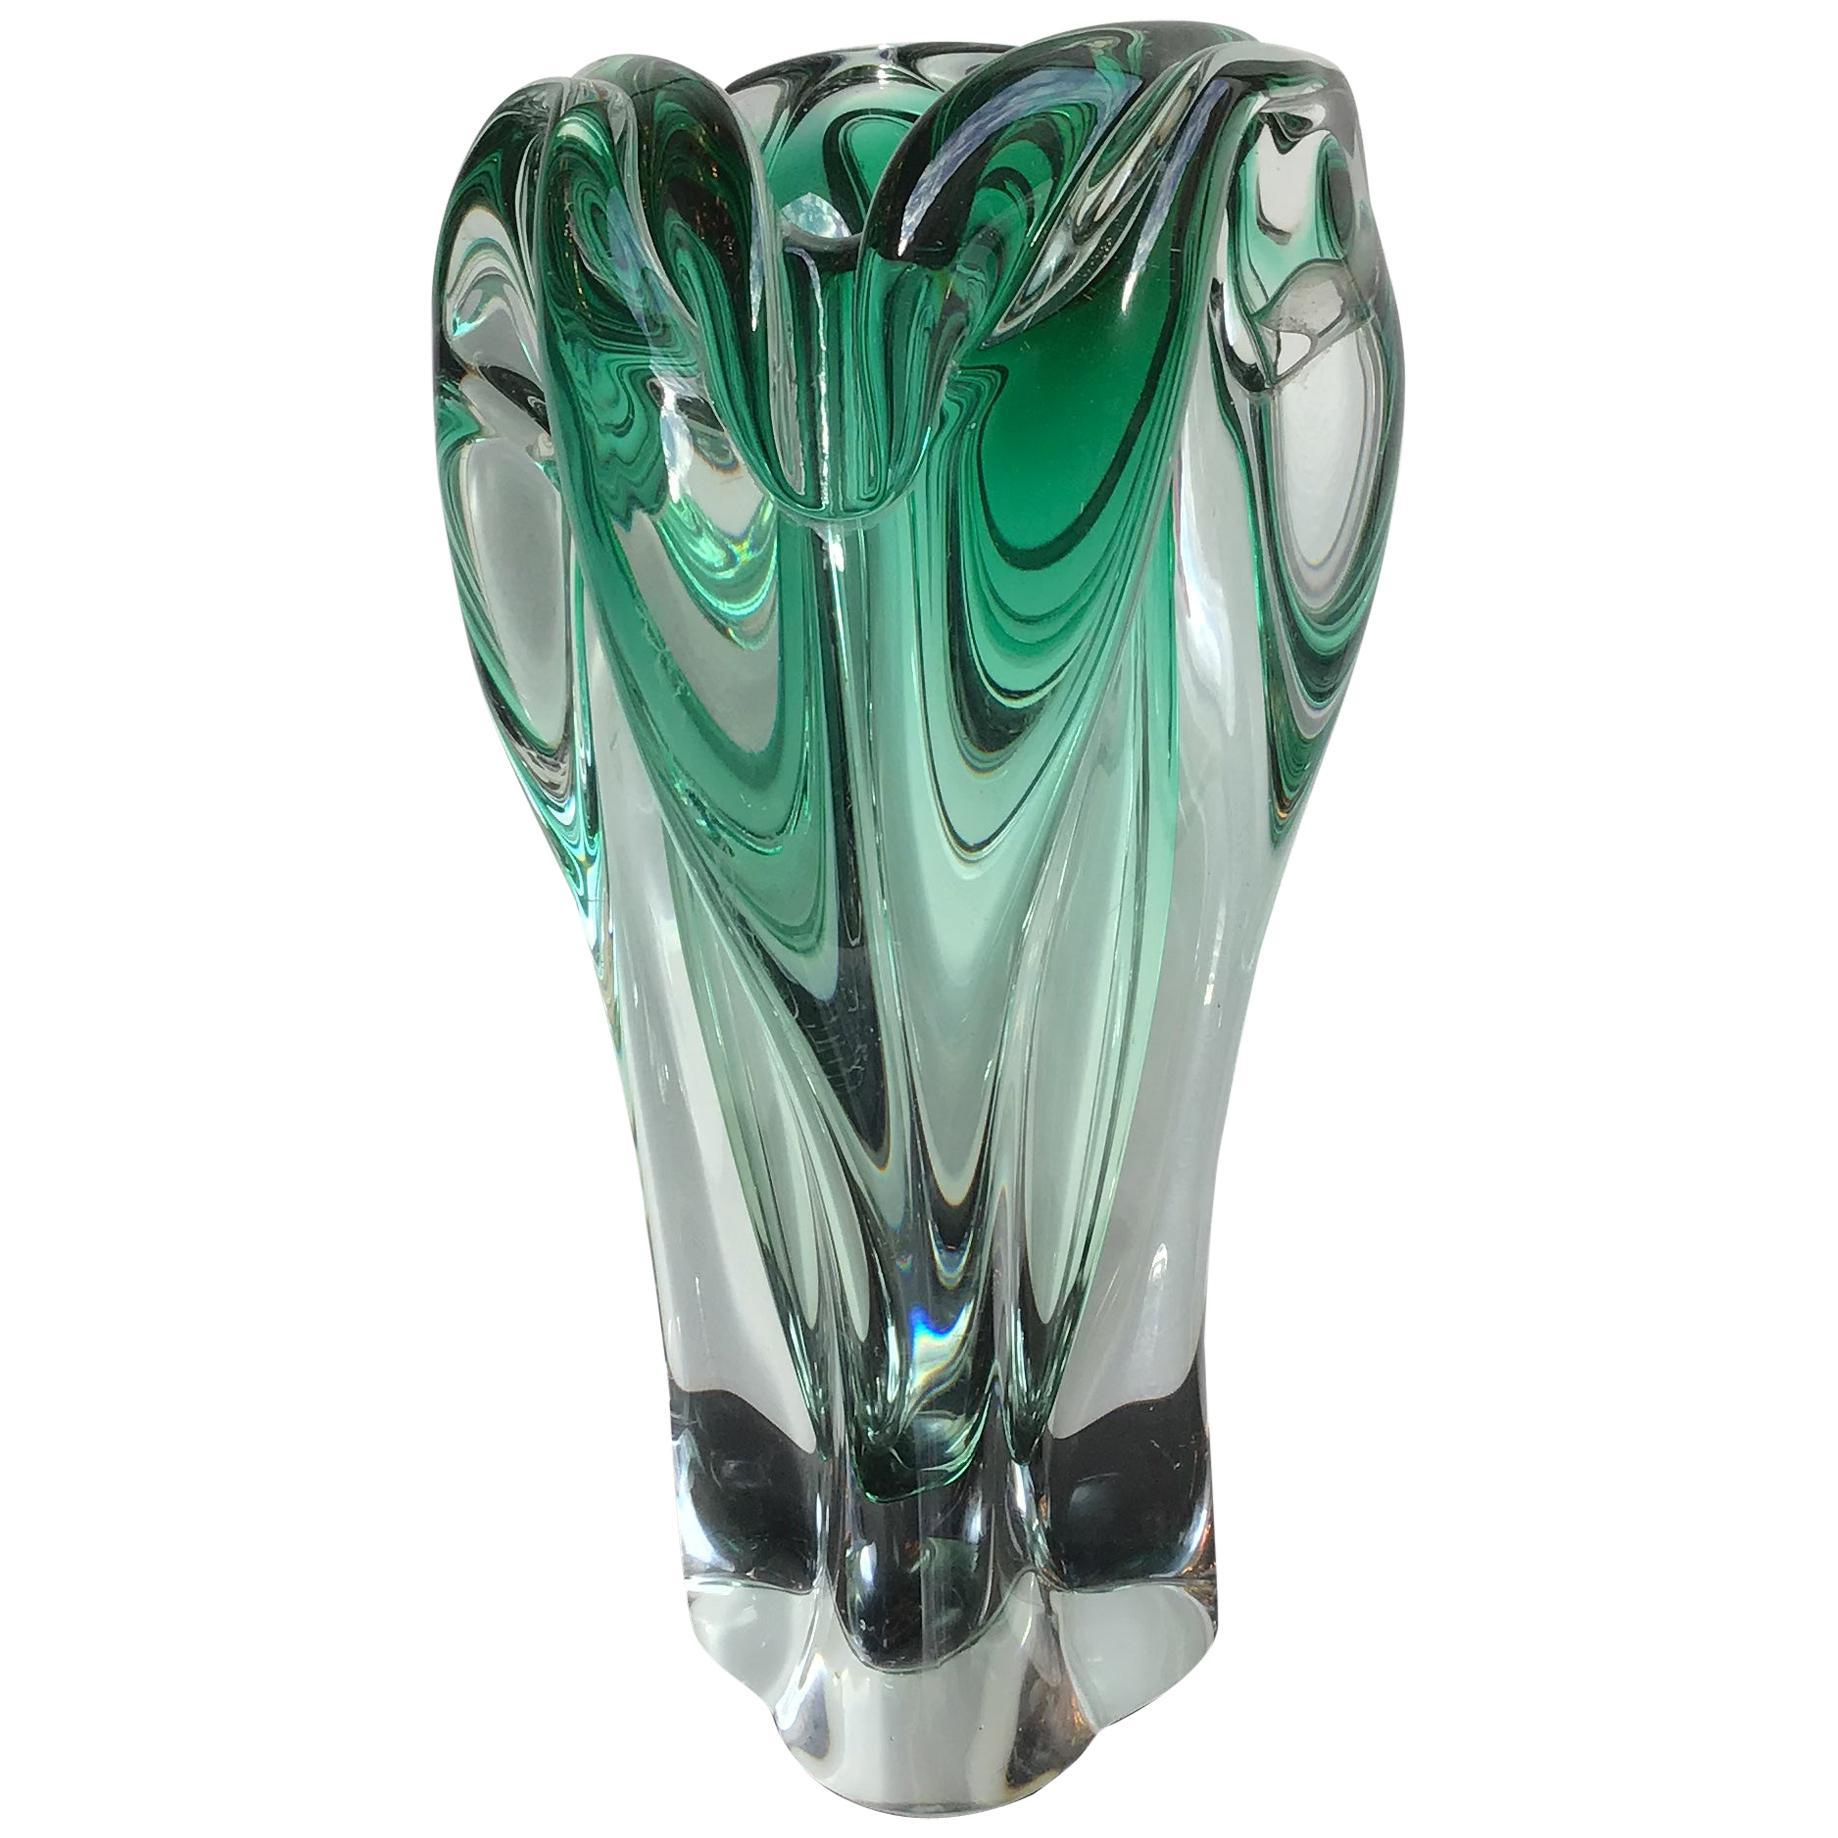 Seguso Vase Green Murano Glass, 1950, Italy